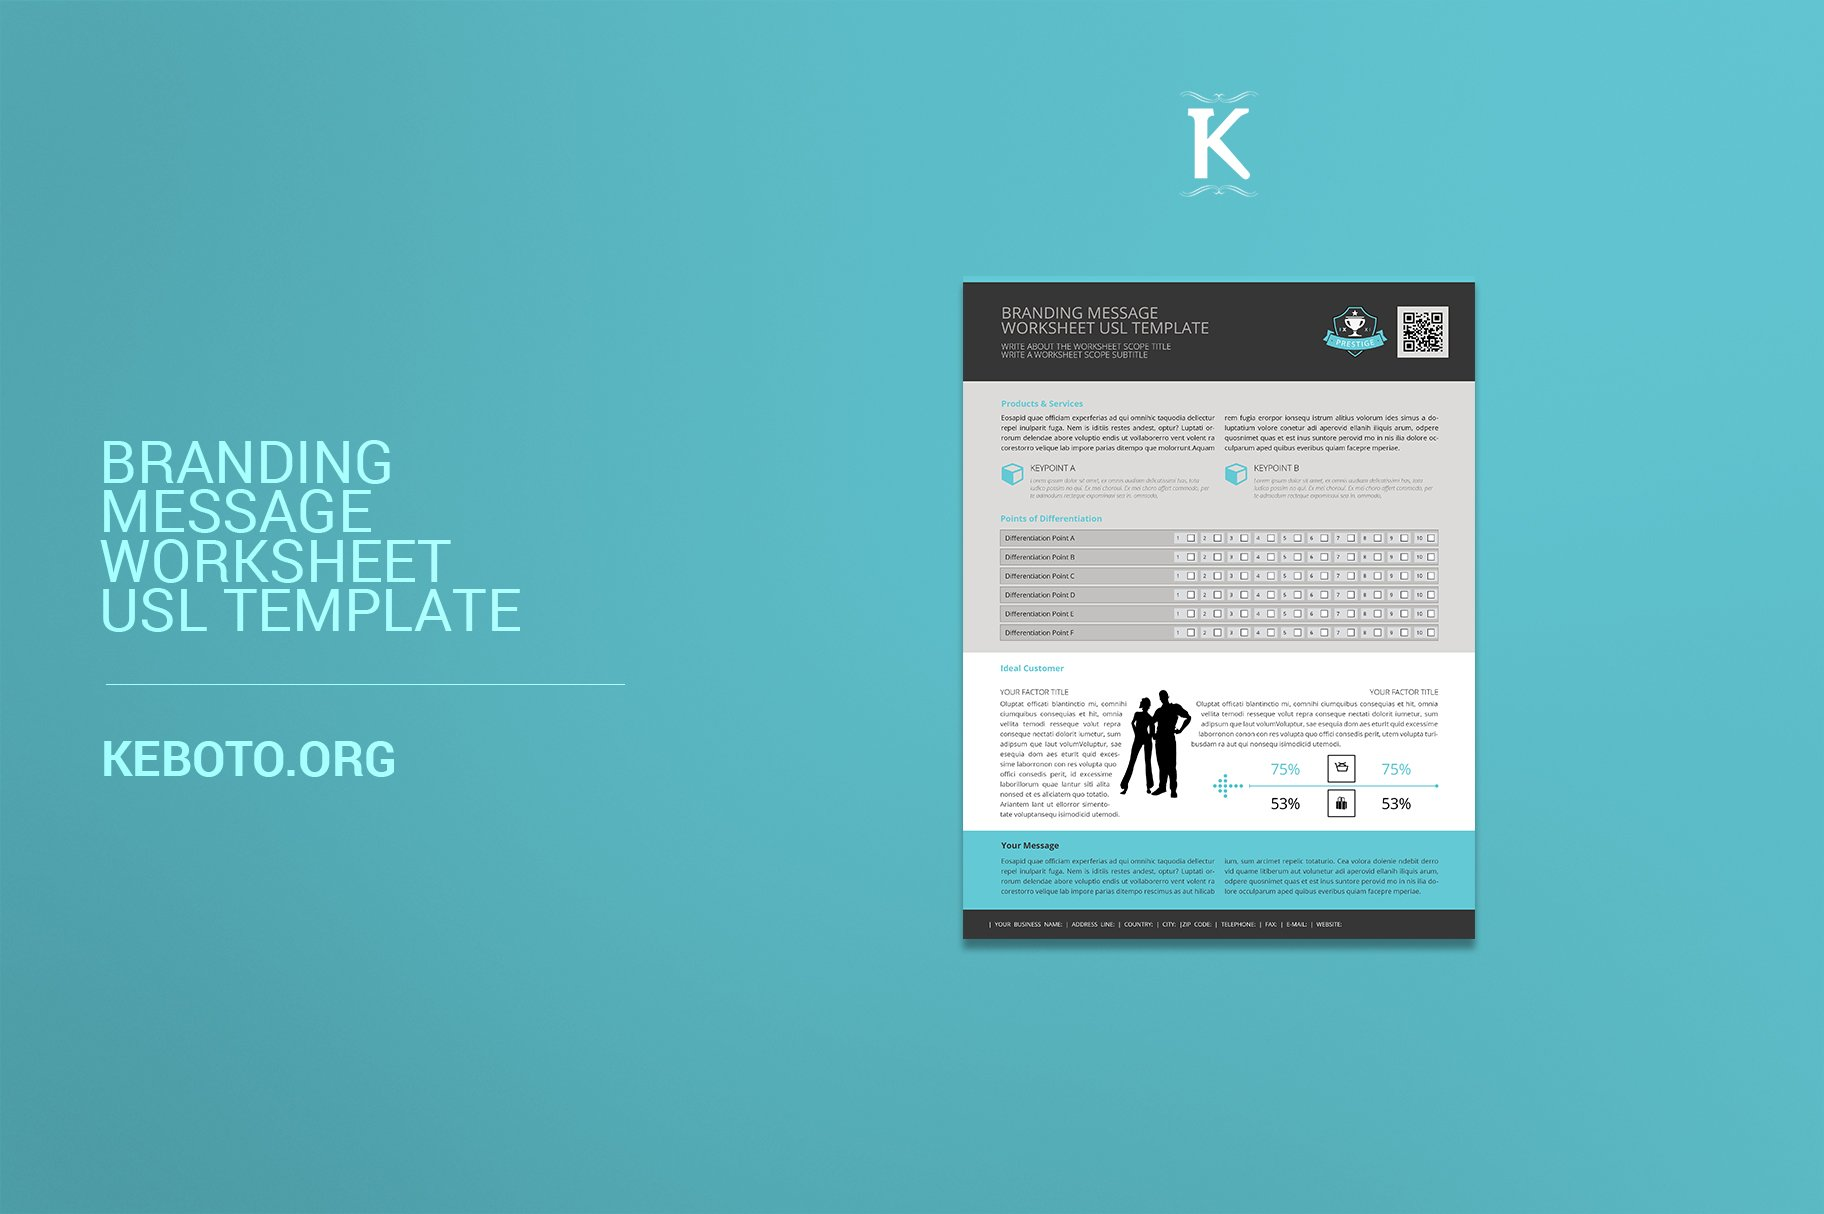 Branding Message Worksheet USL